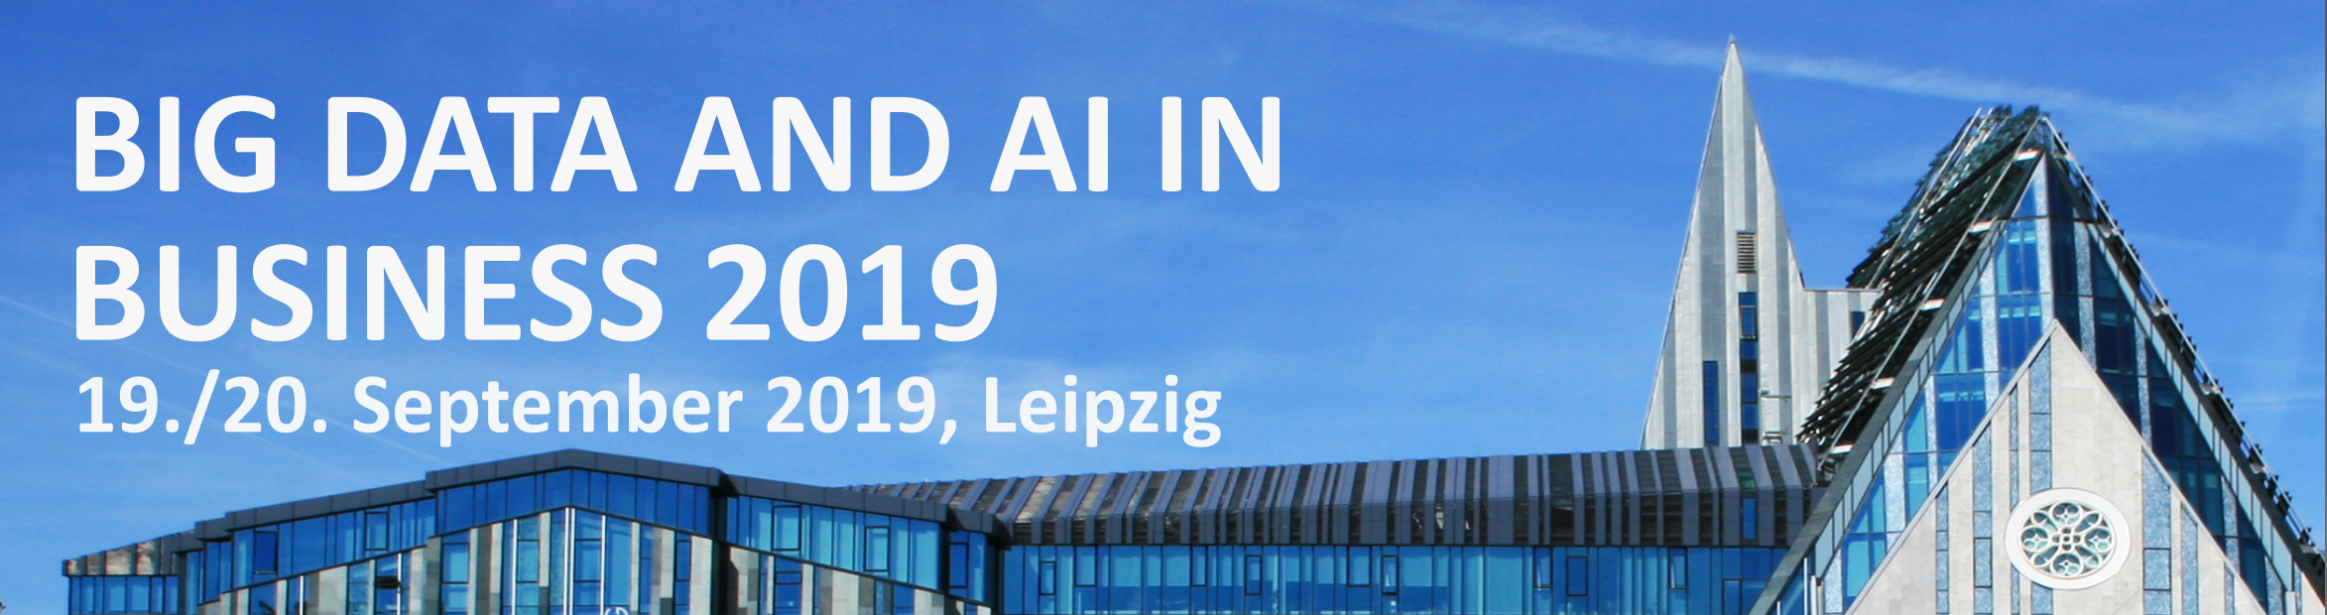 Big Data AI in Business Workshop 2019